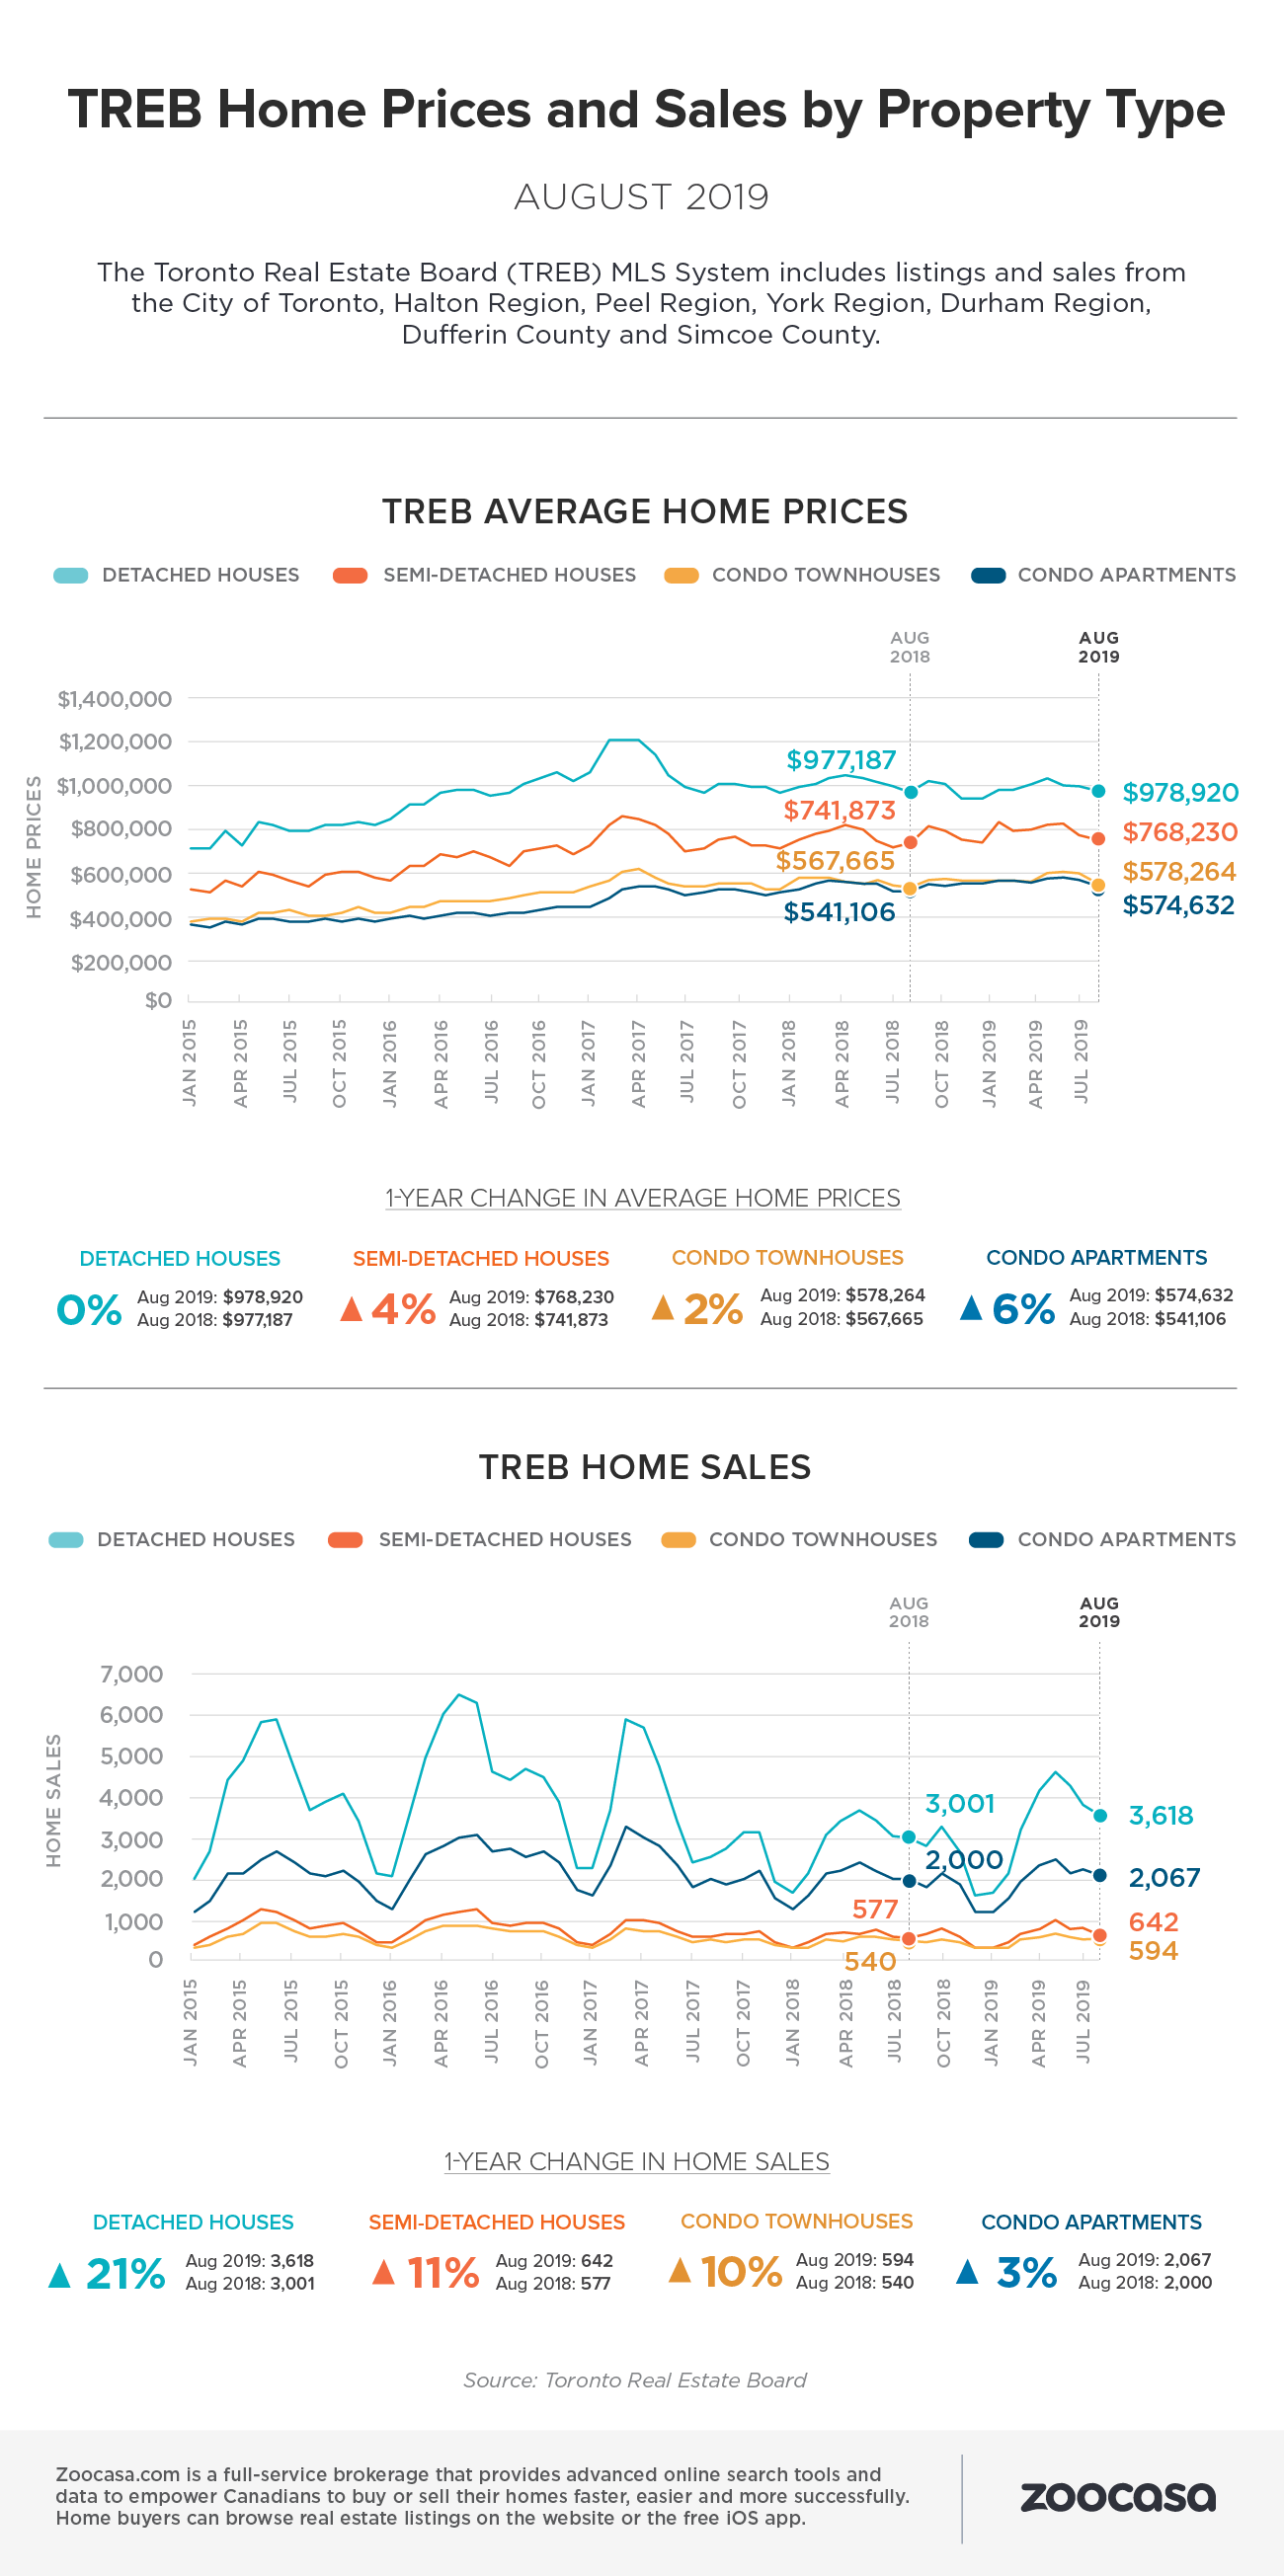 treb-home-sales-prices-aug-2019